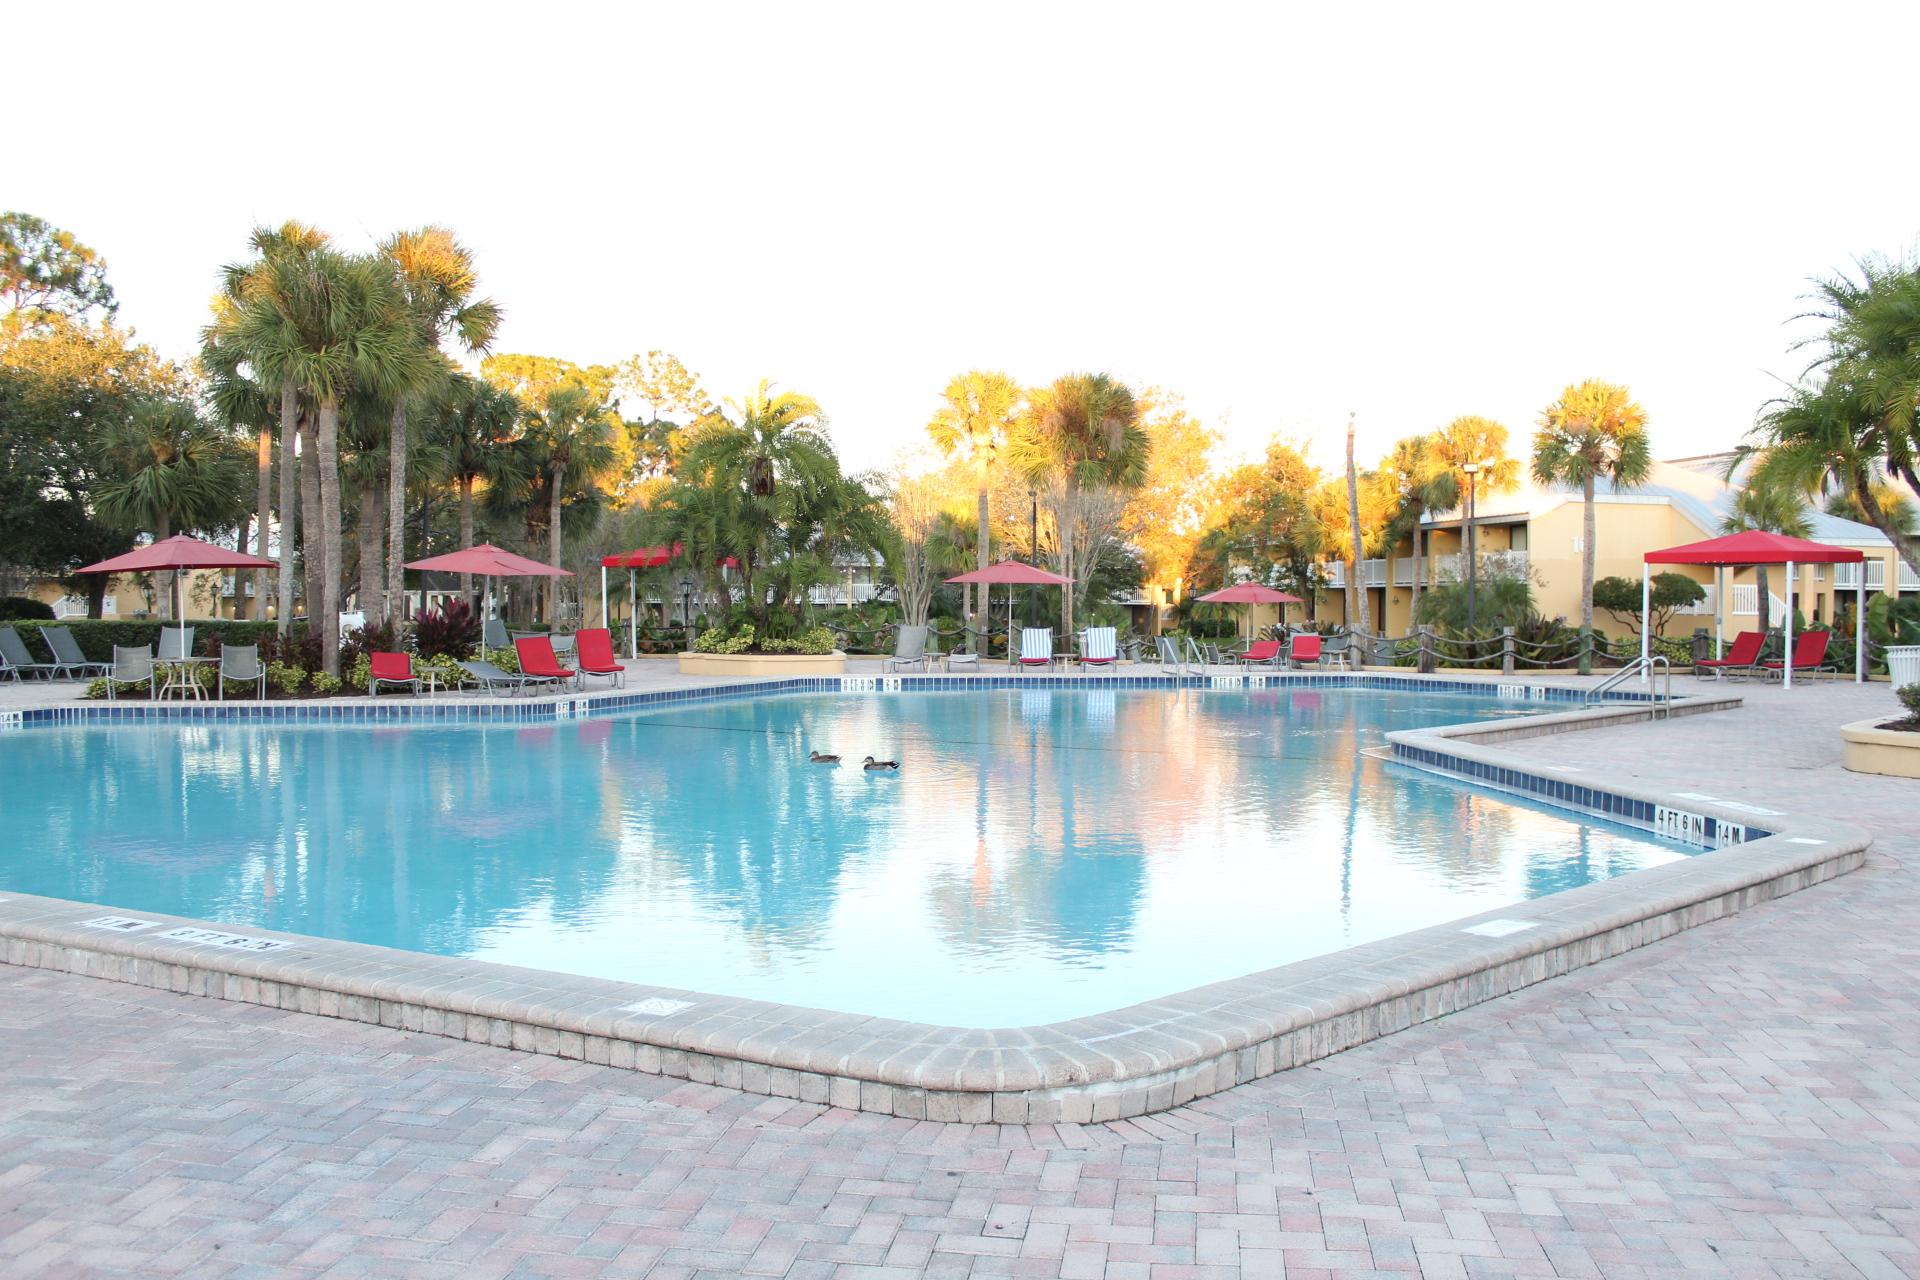 The pool at Wyndham Orlando Resort International Drive